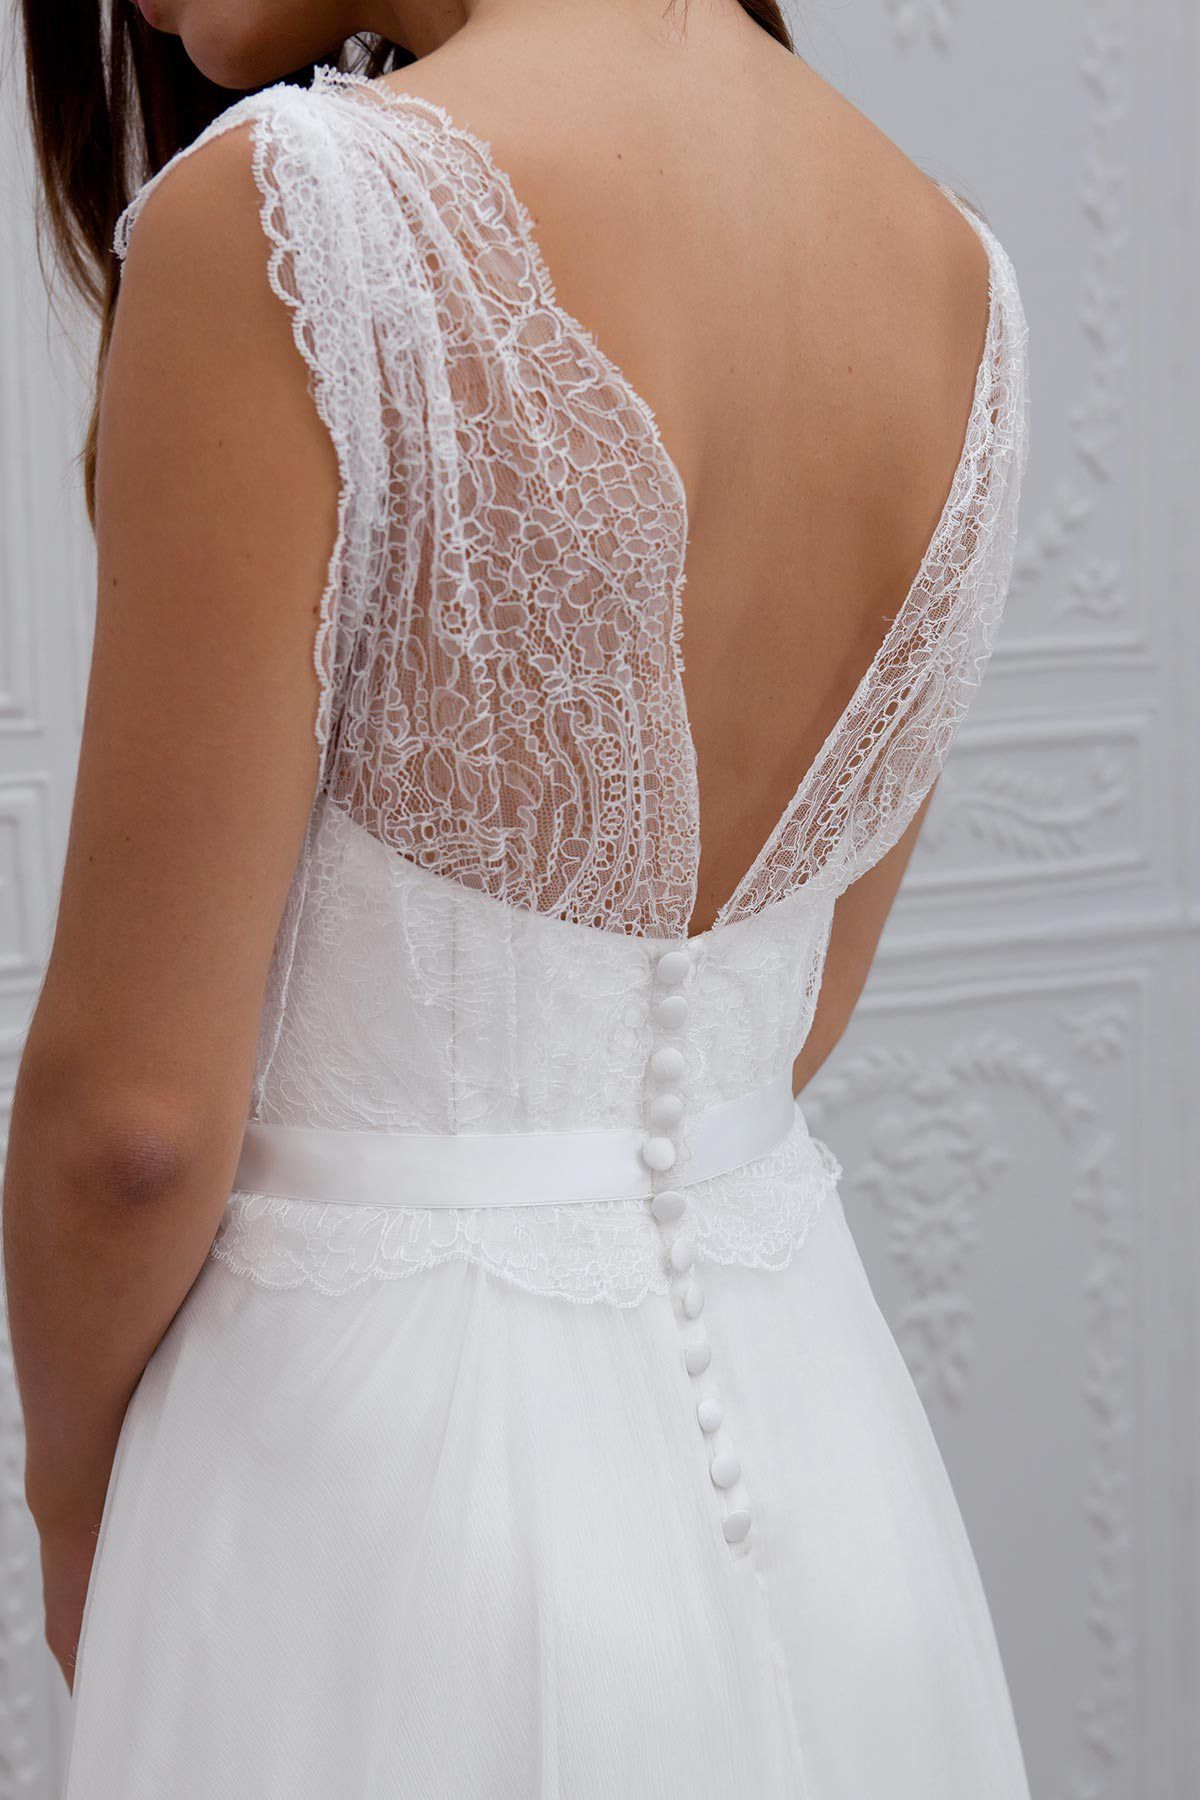 86f5a8ac3a729 wedding dress robes mariee marie laporte 35 Magnifique Robe De Mariée,  Belle Robe, Robe De Mariée Paris, Robe Mariée